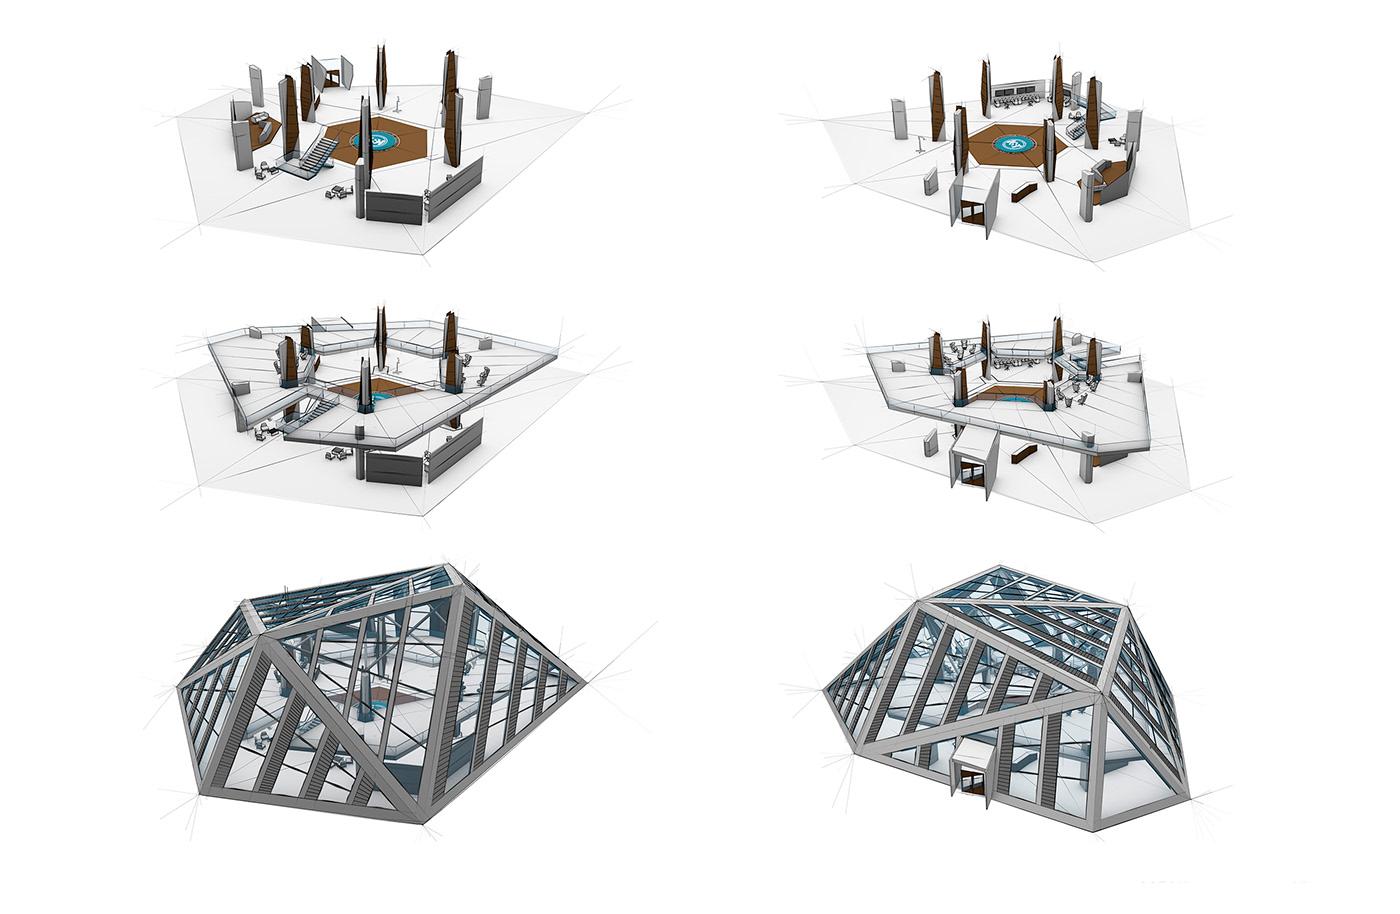 vr AR CGI virtual studio 3ds max virtual realiry Unreal Engine